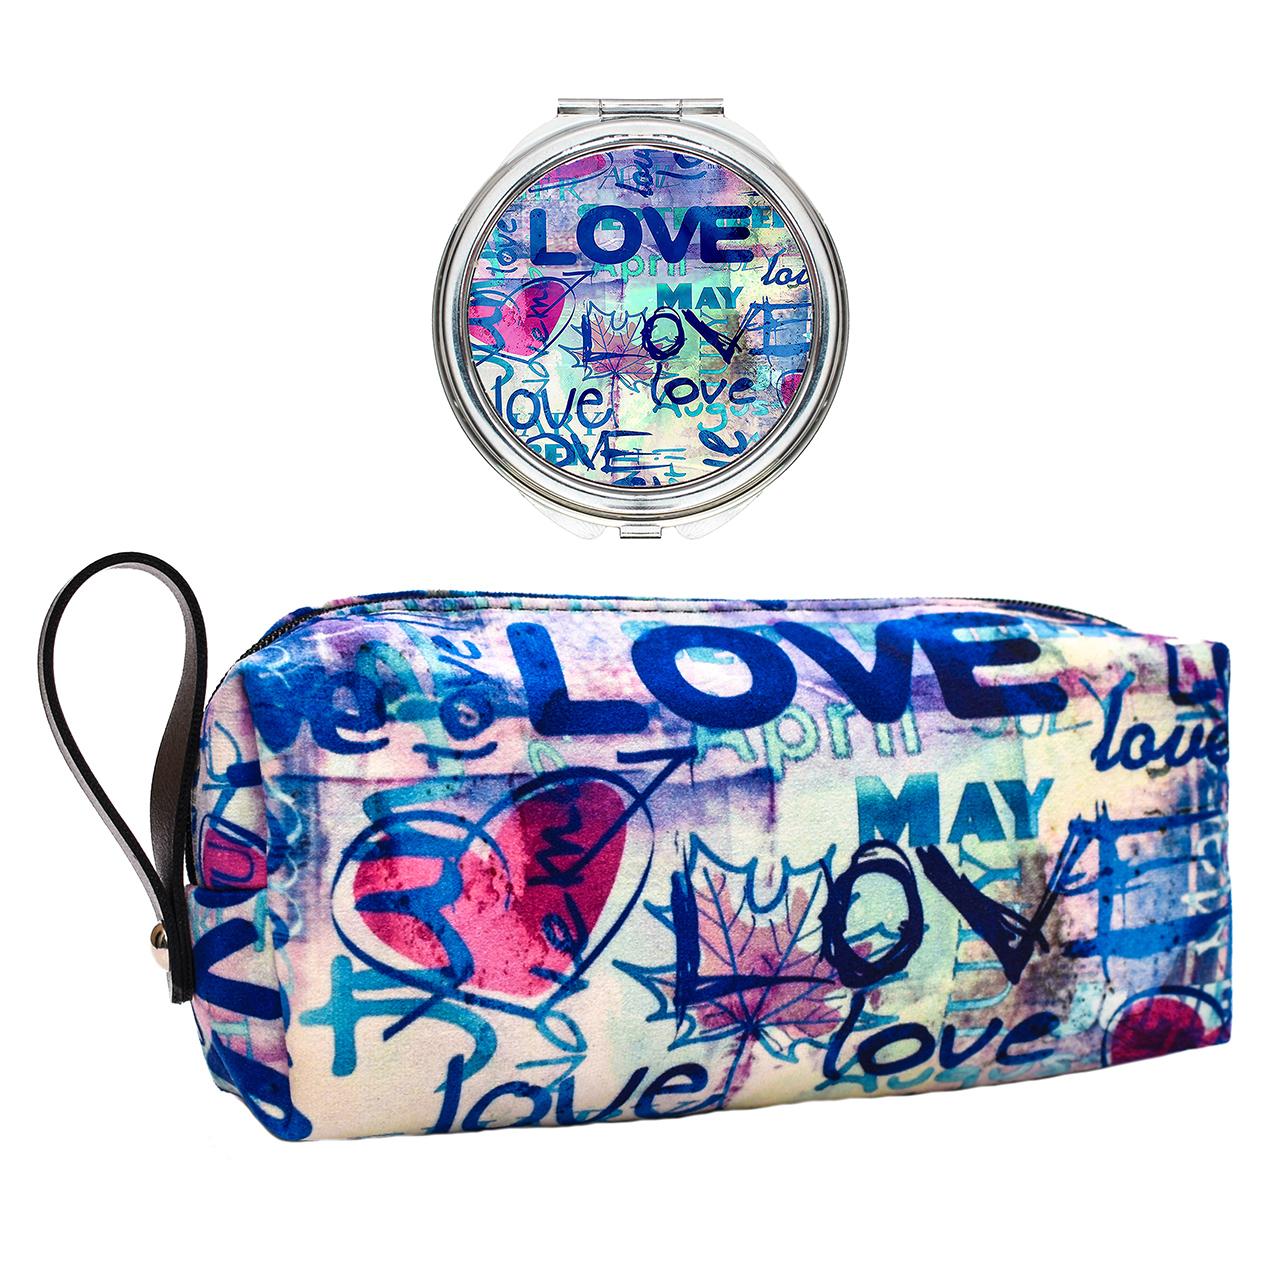 پک کیف و آینه آرایشی لومانا کد 010